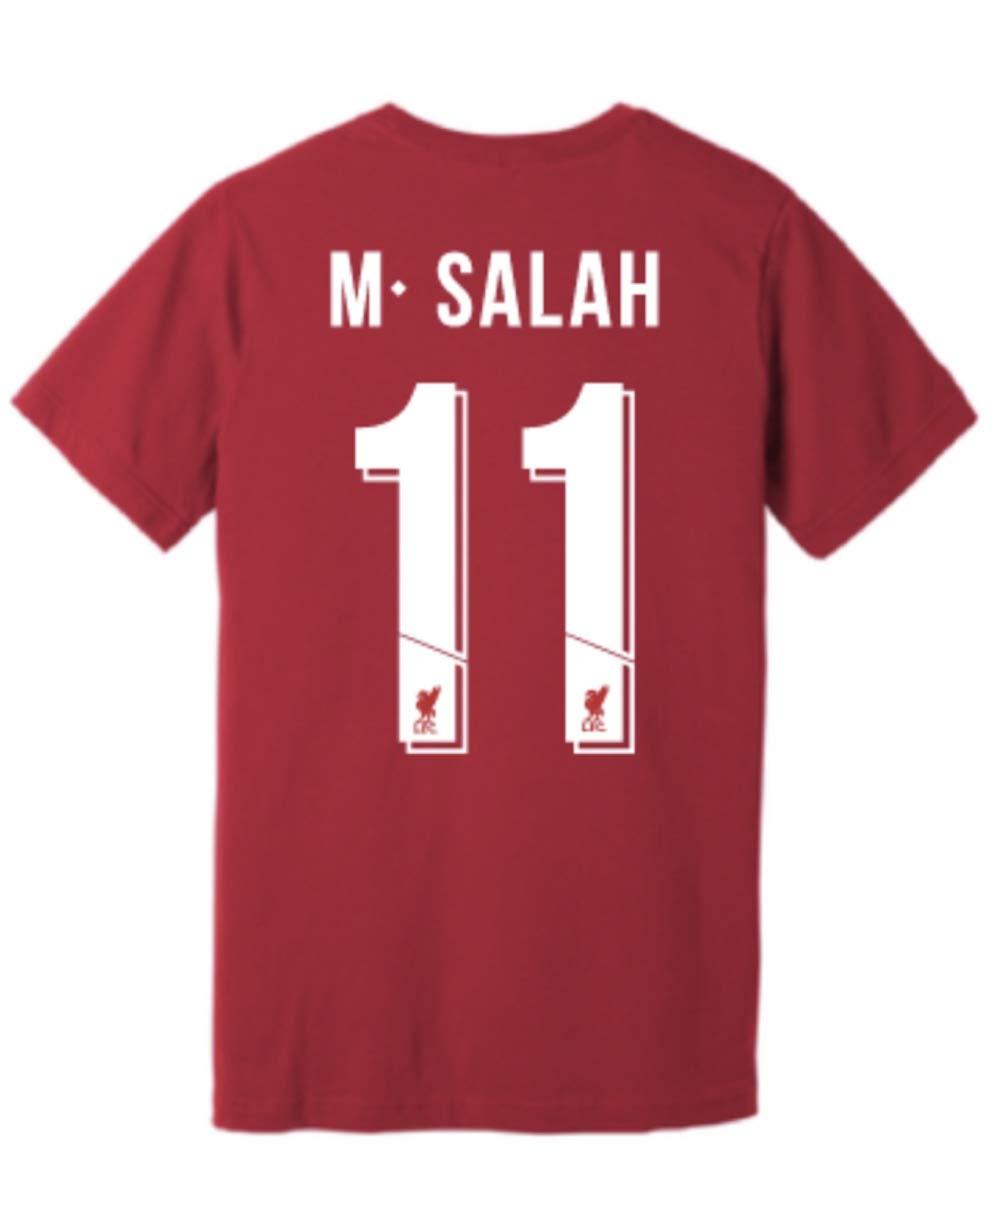 separation shoes f7d37 3eeb5 Anfield Shop Liverpool FC Salah T Shirt